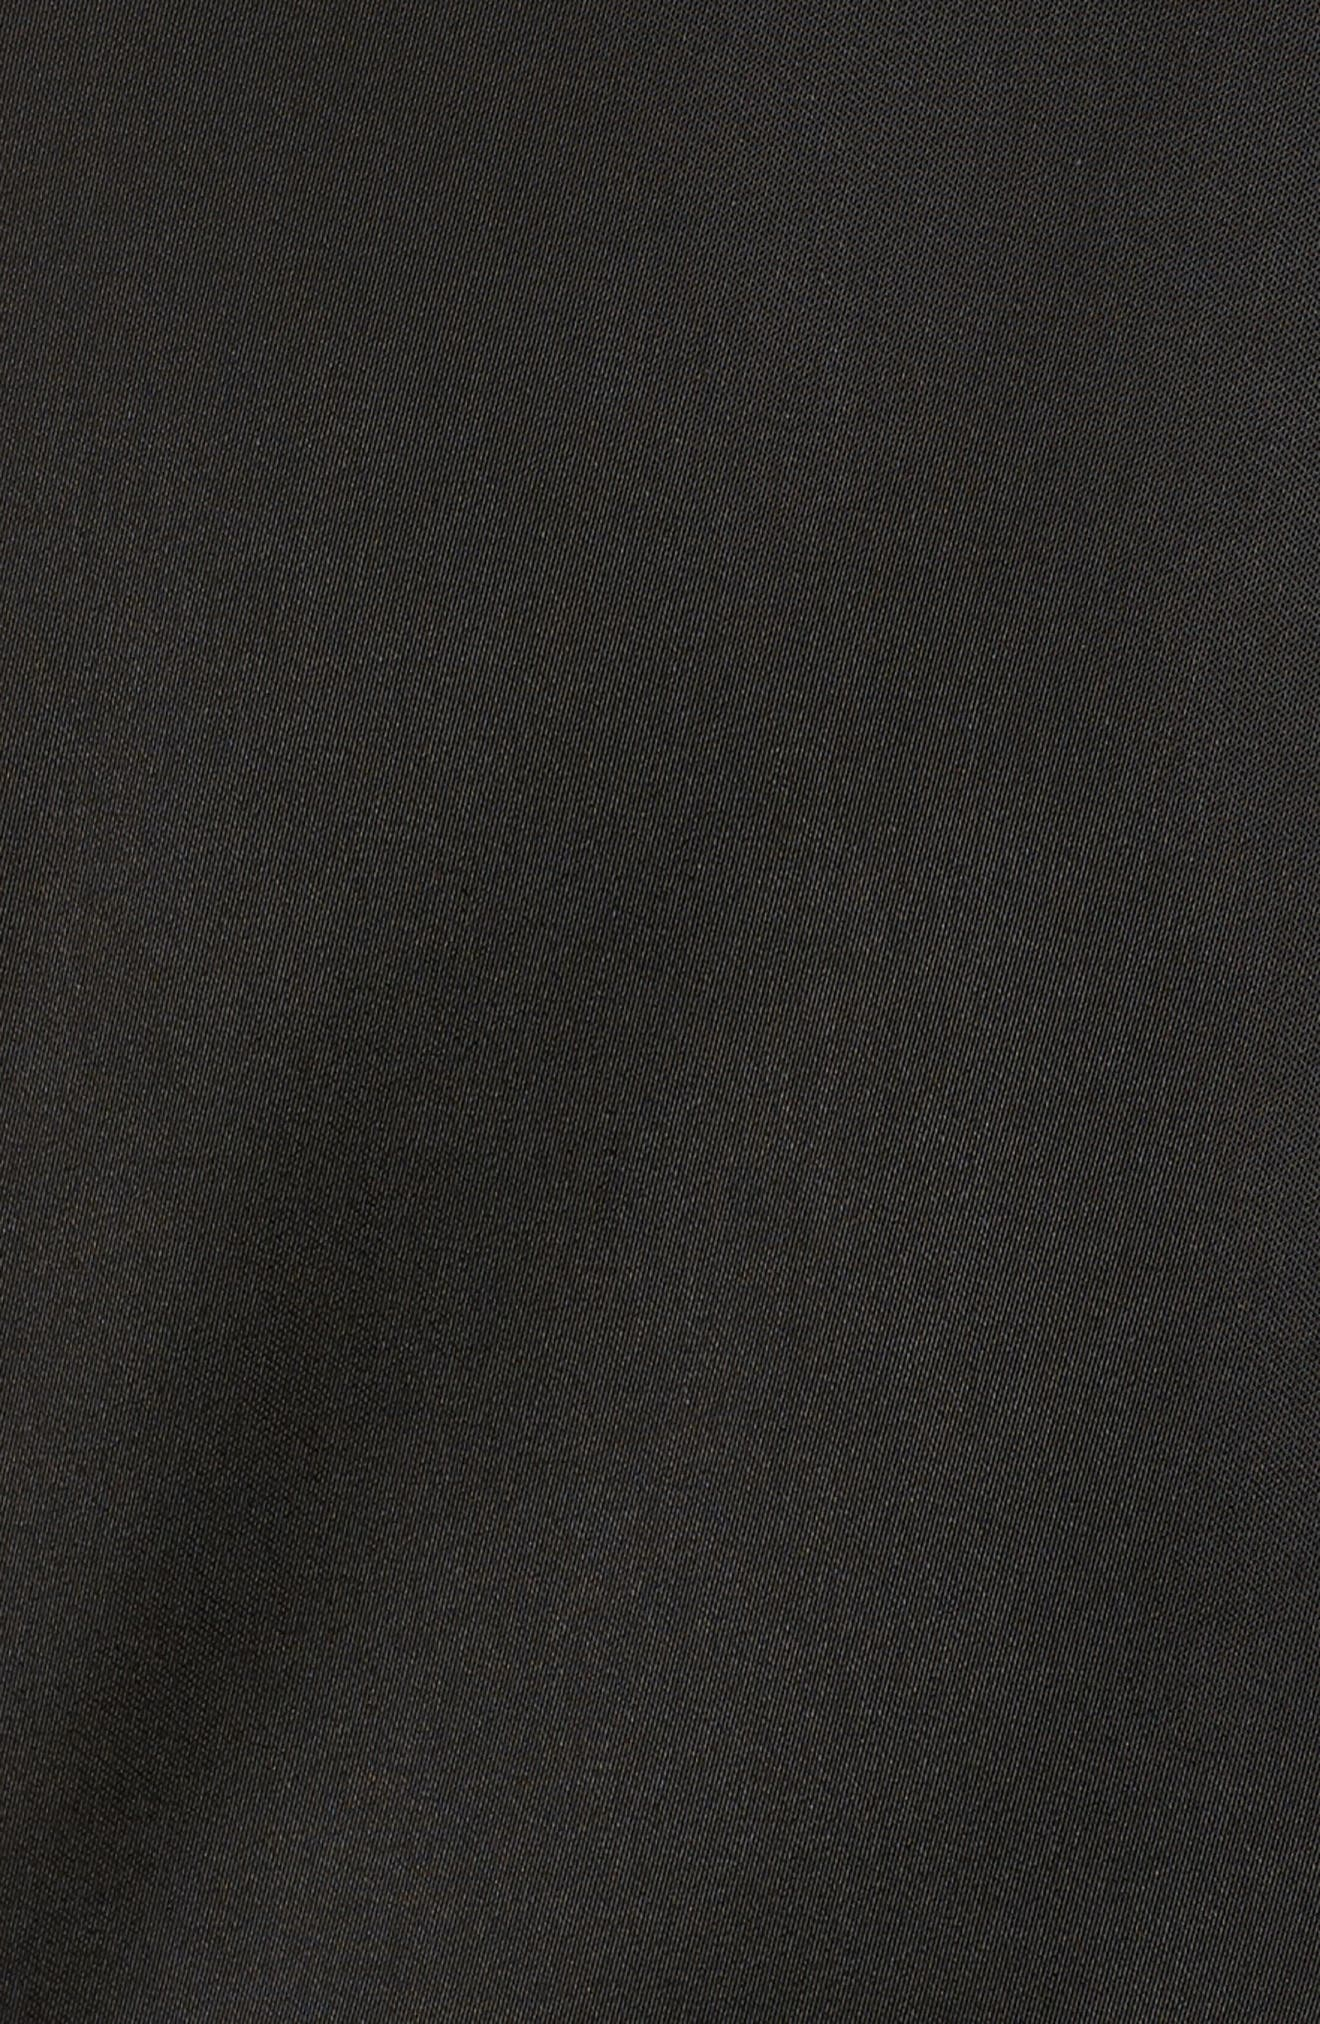 Faux Fur Trim Military Jacket,                             Alternate thumbnail 5, color,                             Black